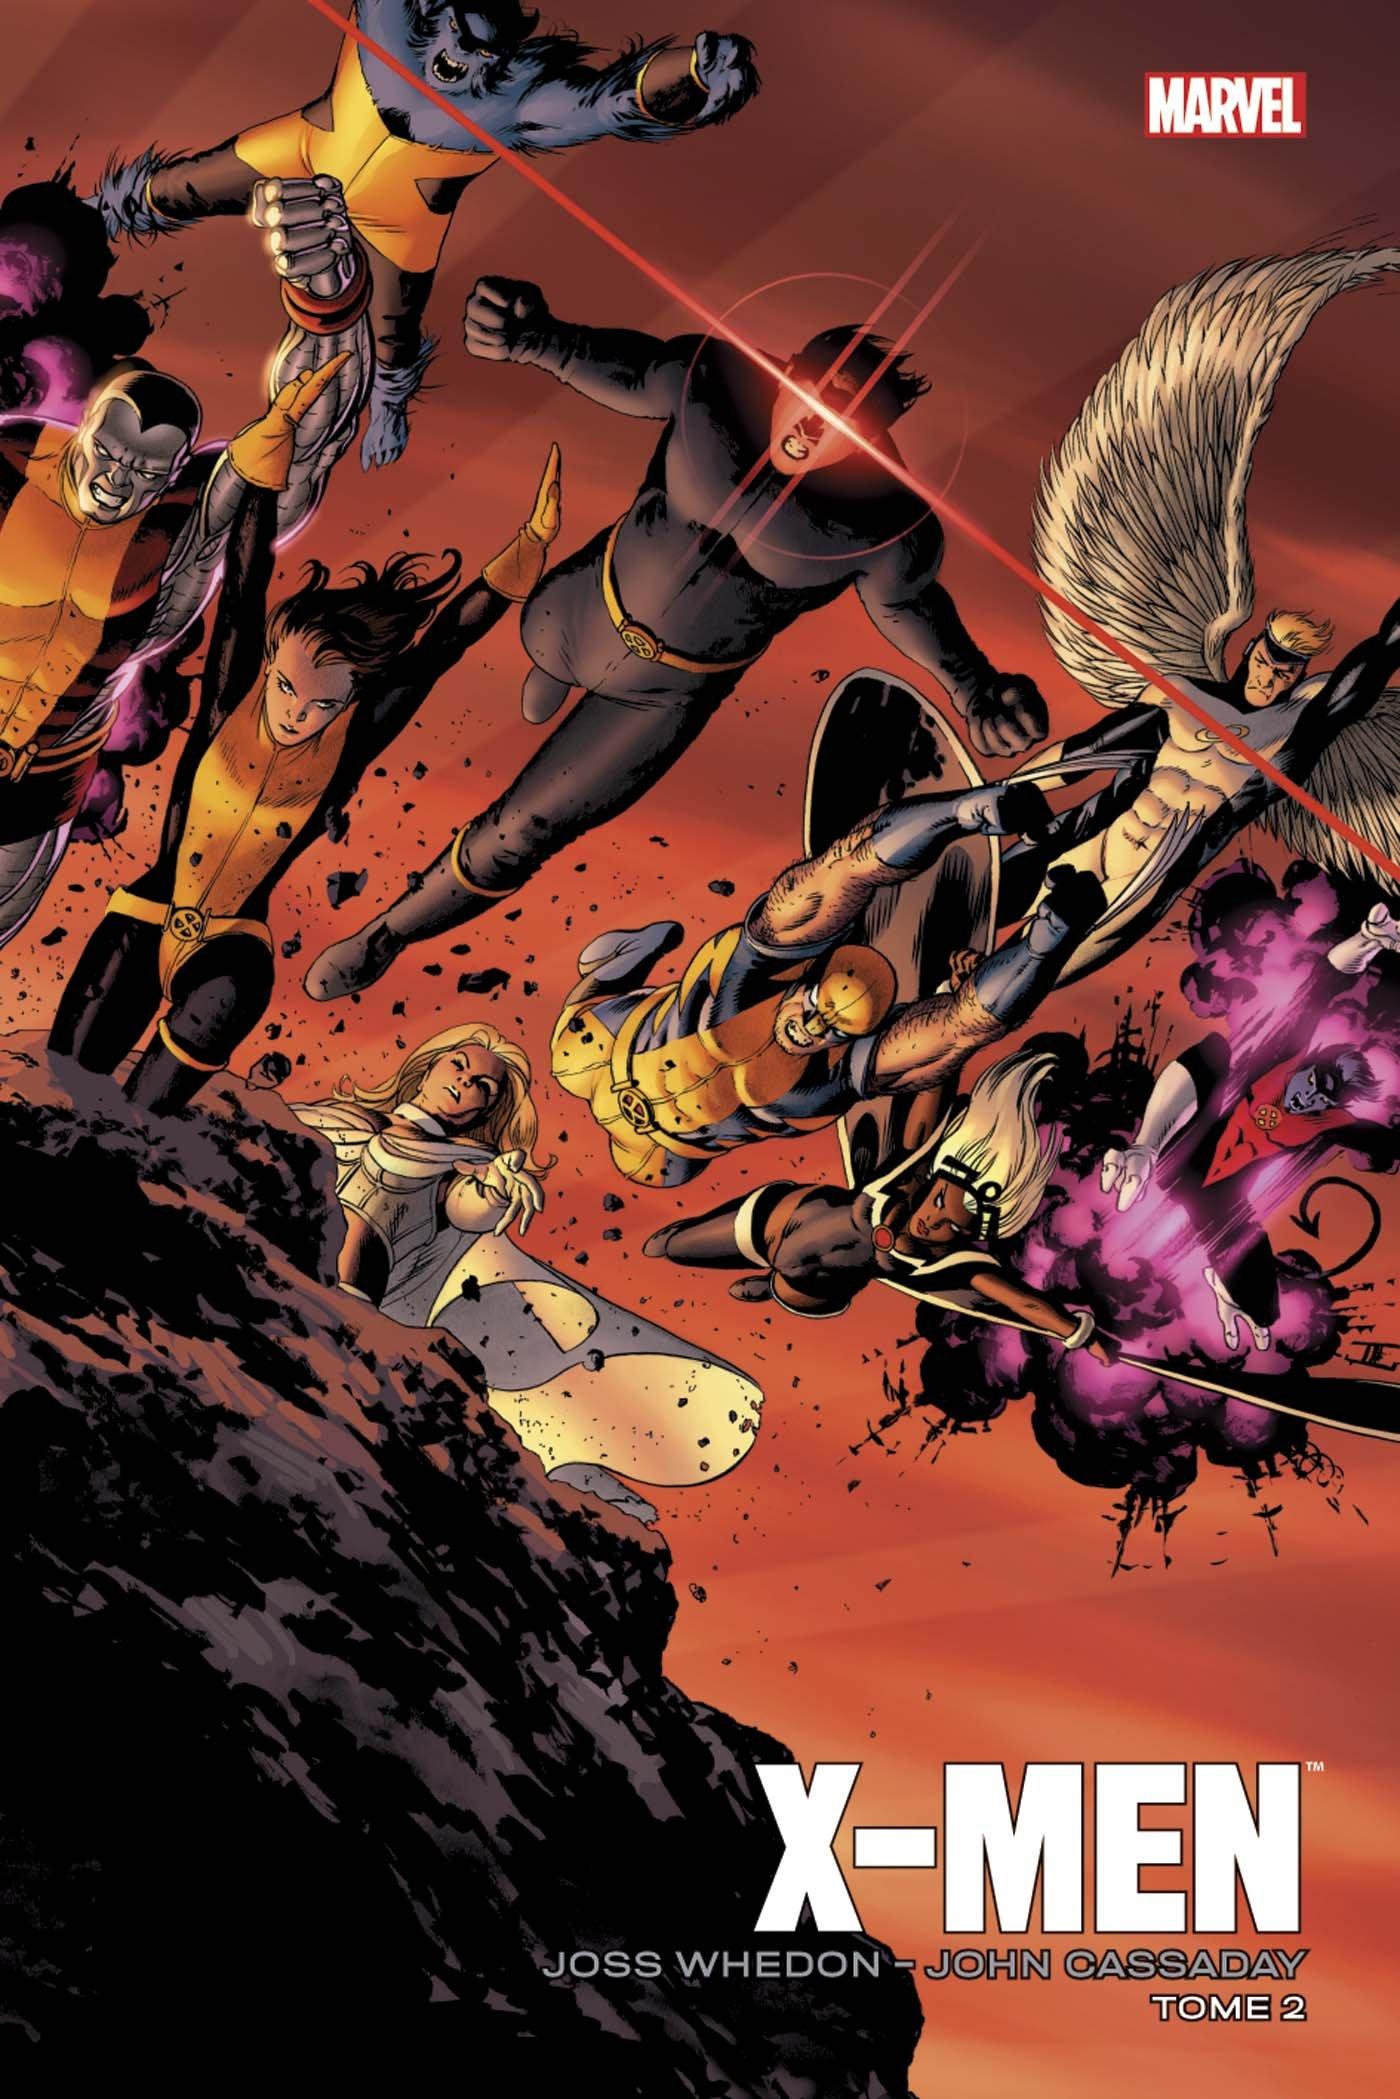 X-MEN PAR WHEDON/CASSADAY 2